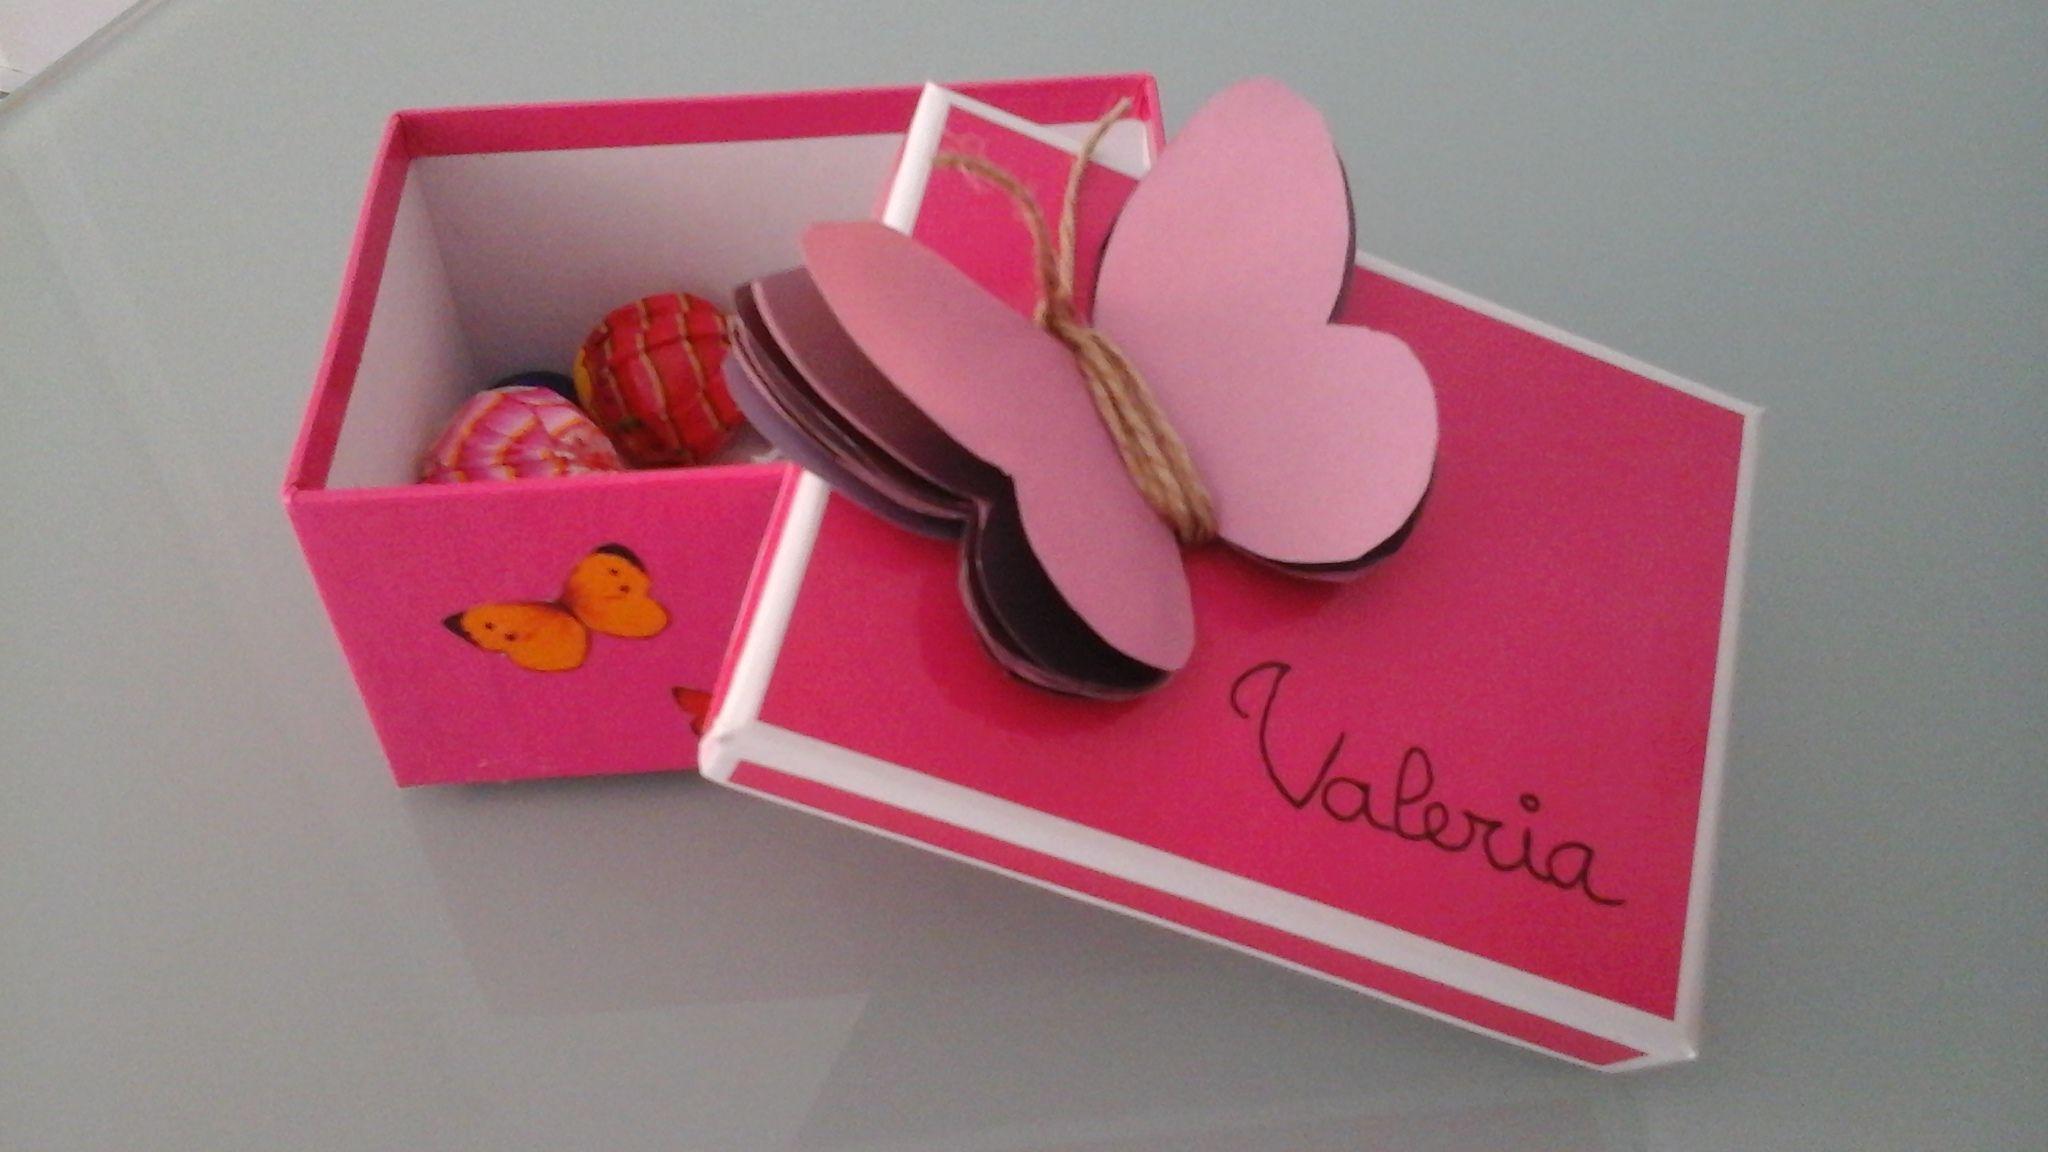 Cajita mariposa para Valeria